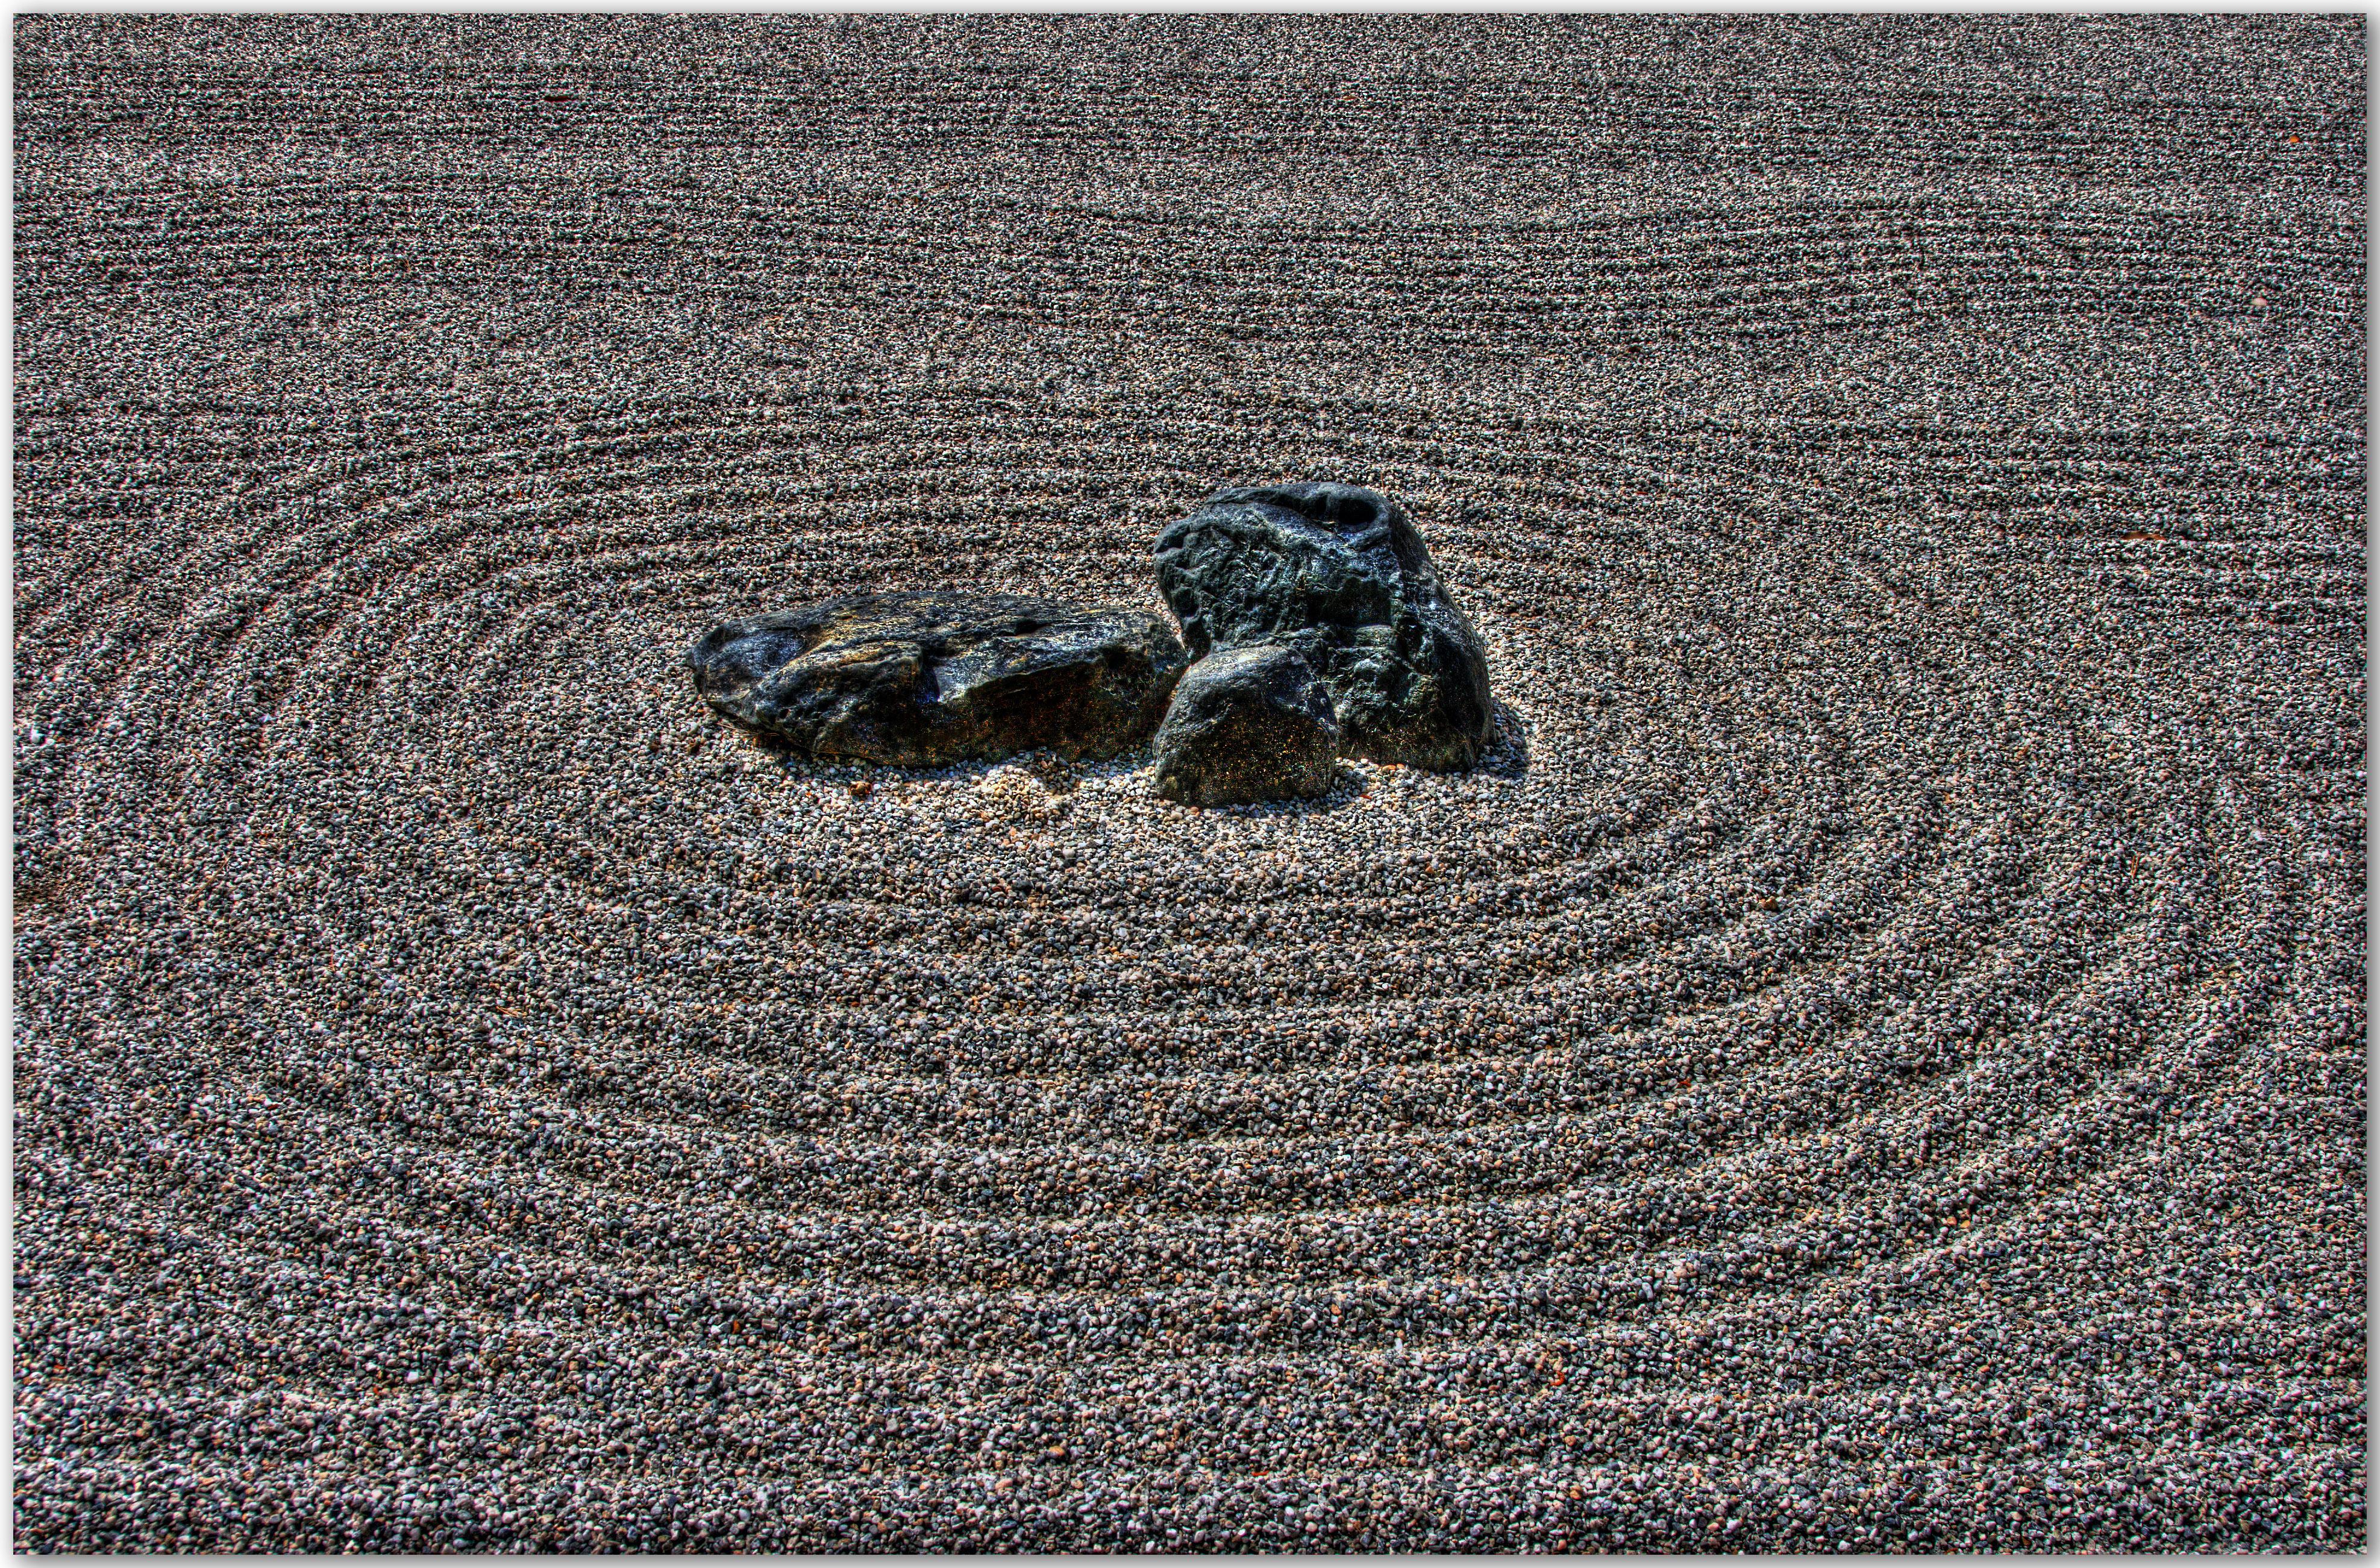 Japanese Rock Garden Flickr Photo Sharing